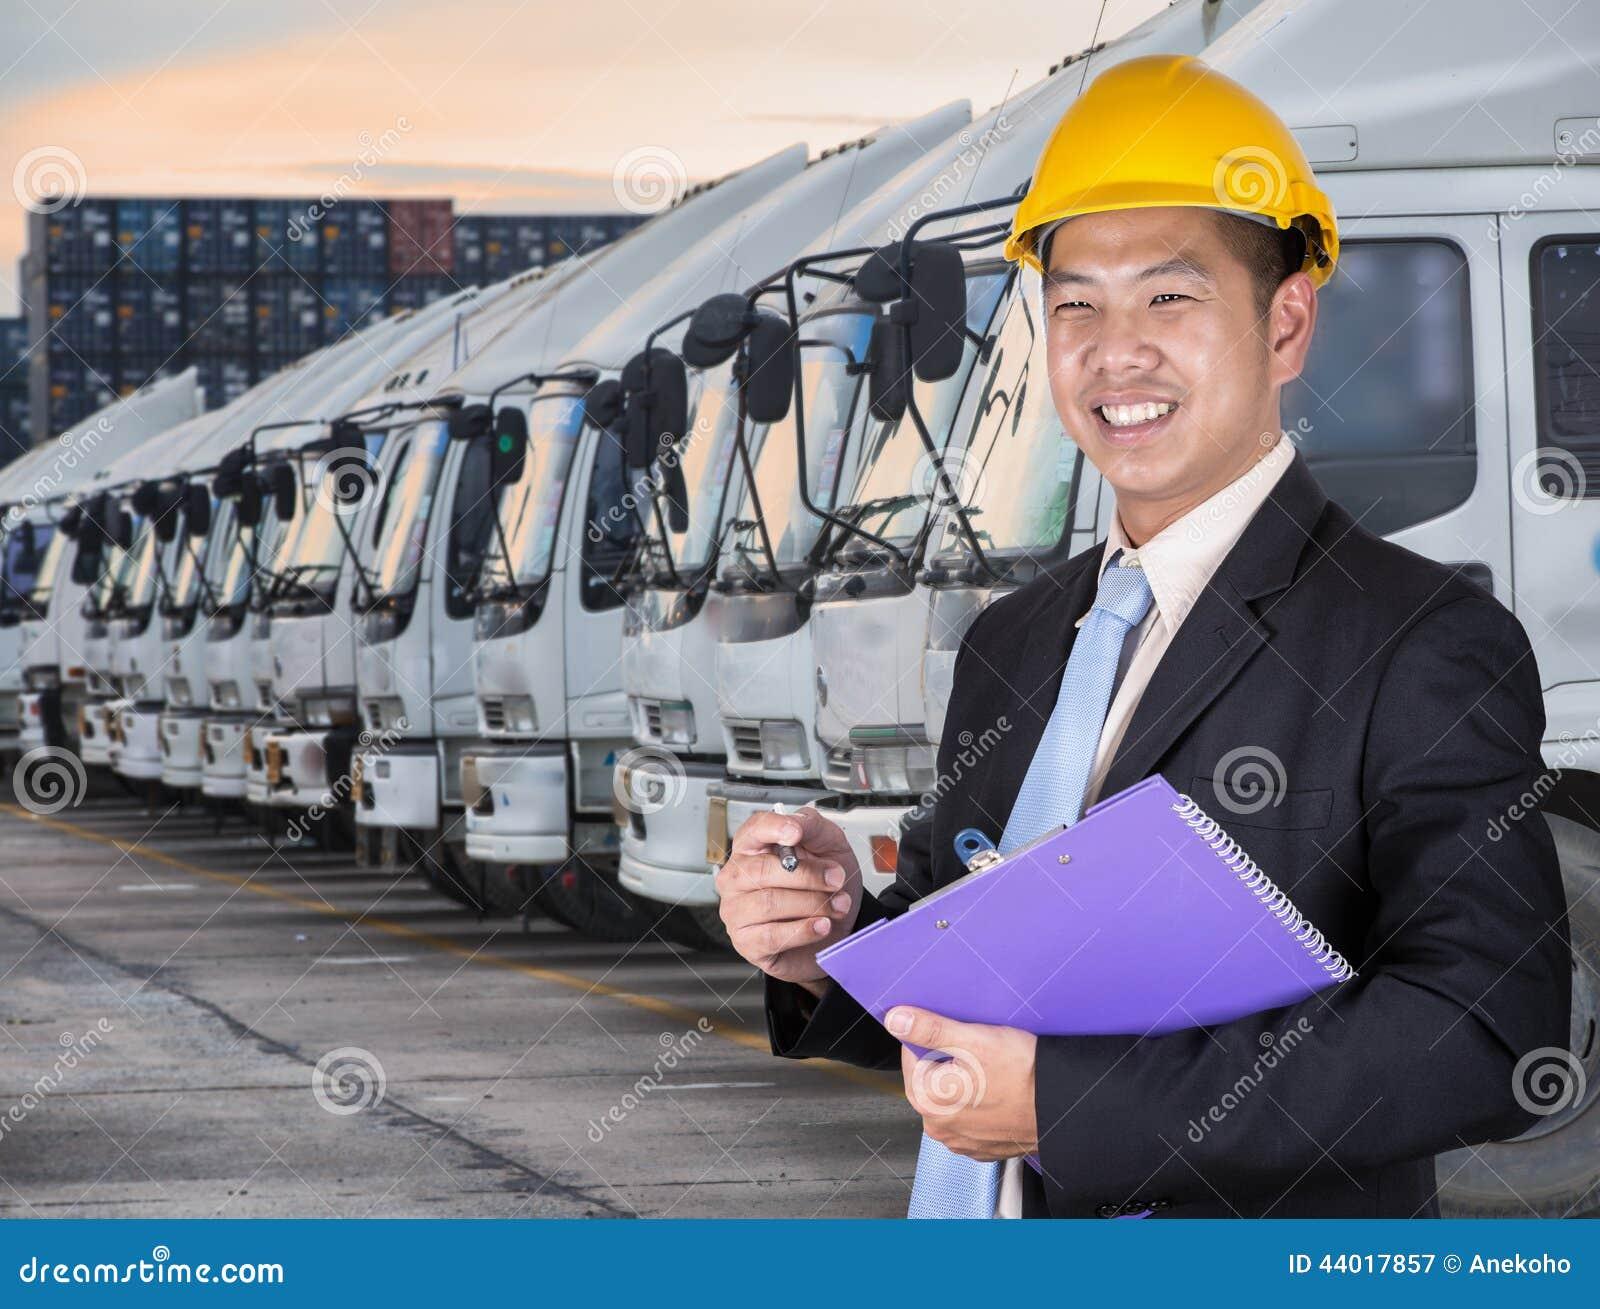 Transportation Engineer Stock Photo - Image: 44017857